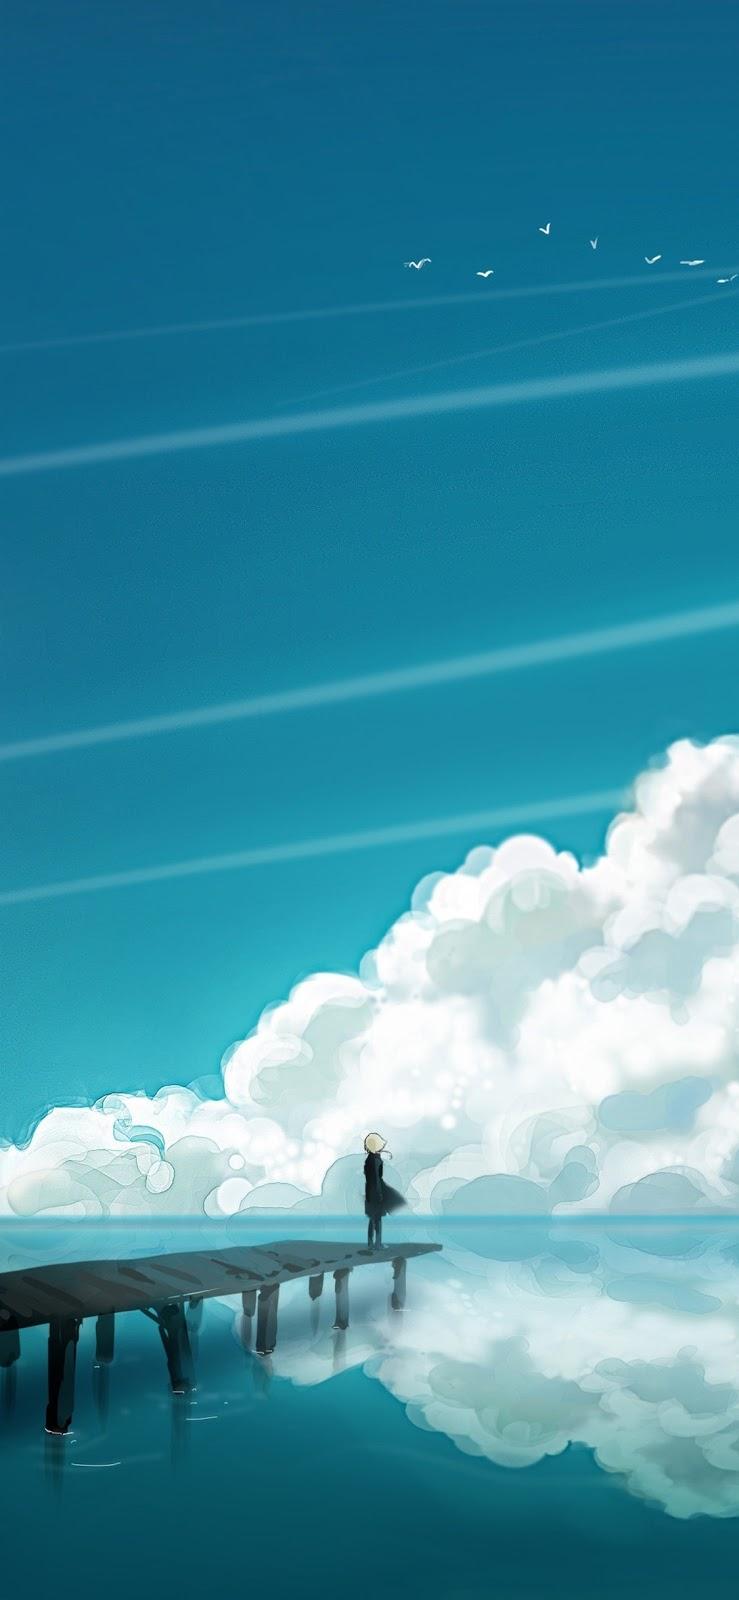 Cloudy Sky (iPhone X)